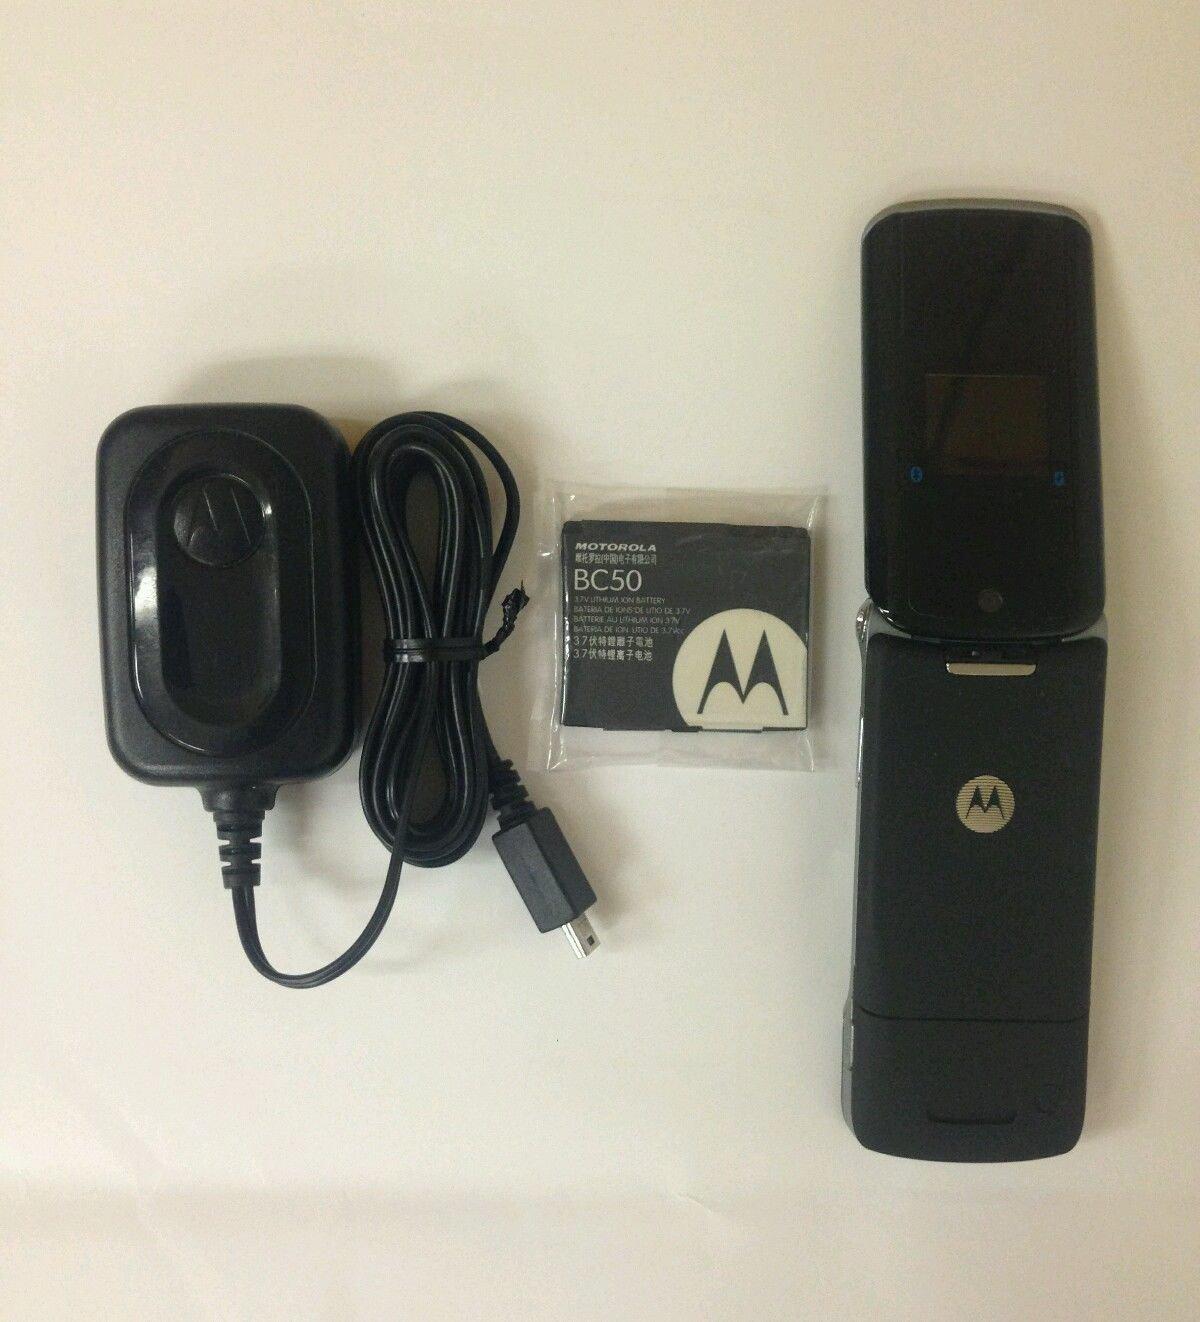 Amazon.com: Motorola KRZR K1m Black Sprint Cell Phone: Cell Phones &  Accessories